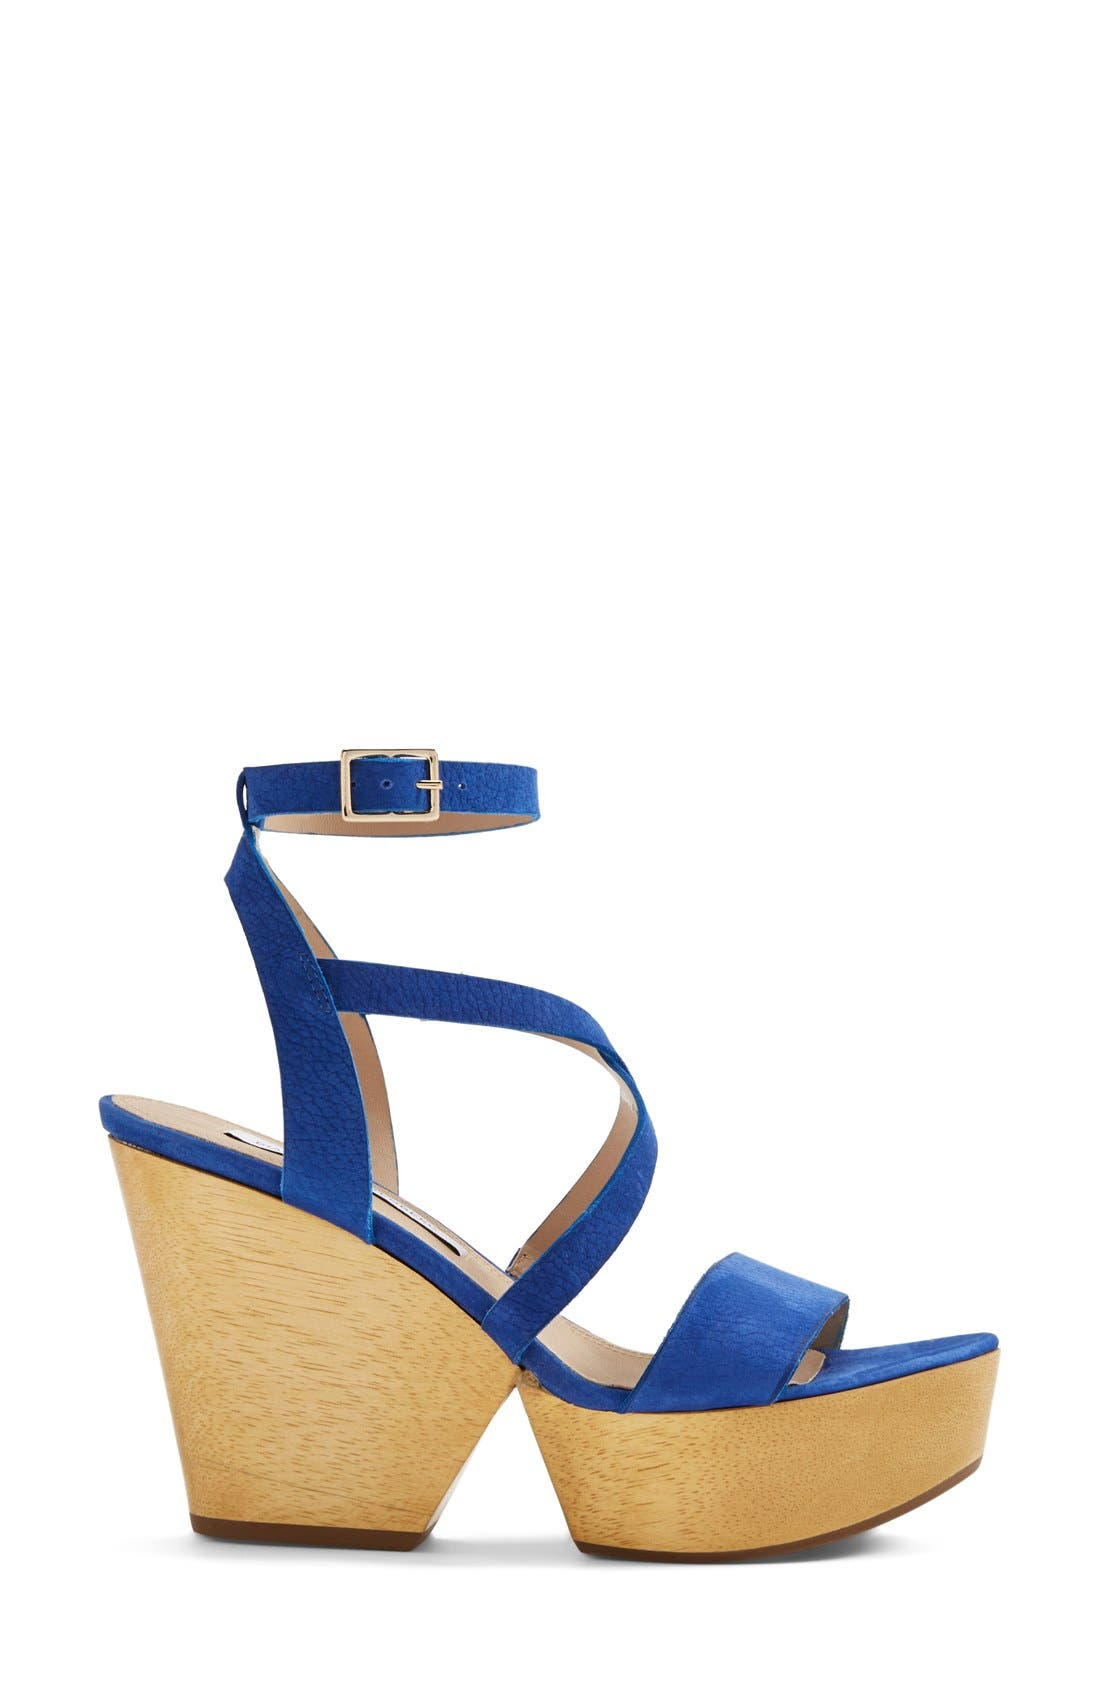 Alternate Image 4  - Diane von Furstenberg 'Lamille' Leather Platform Wedge Sandal (Women)